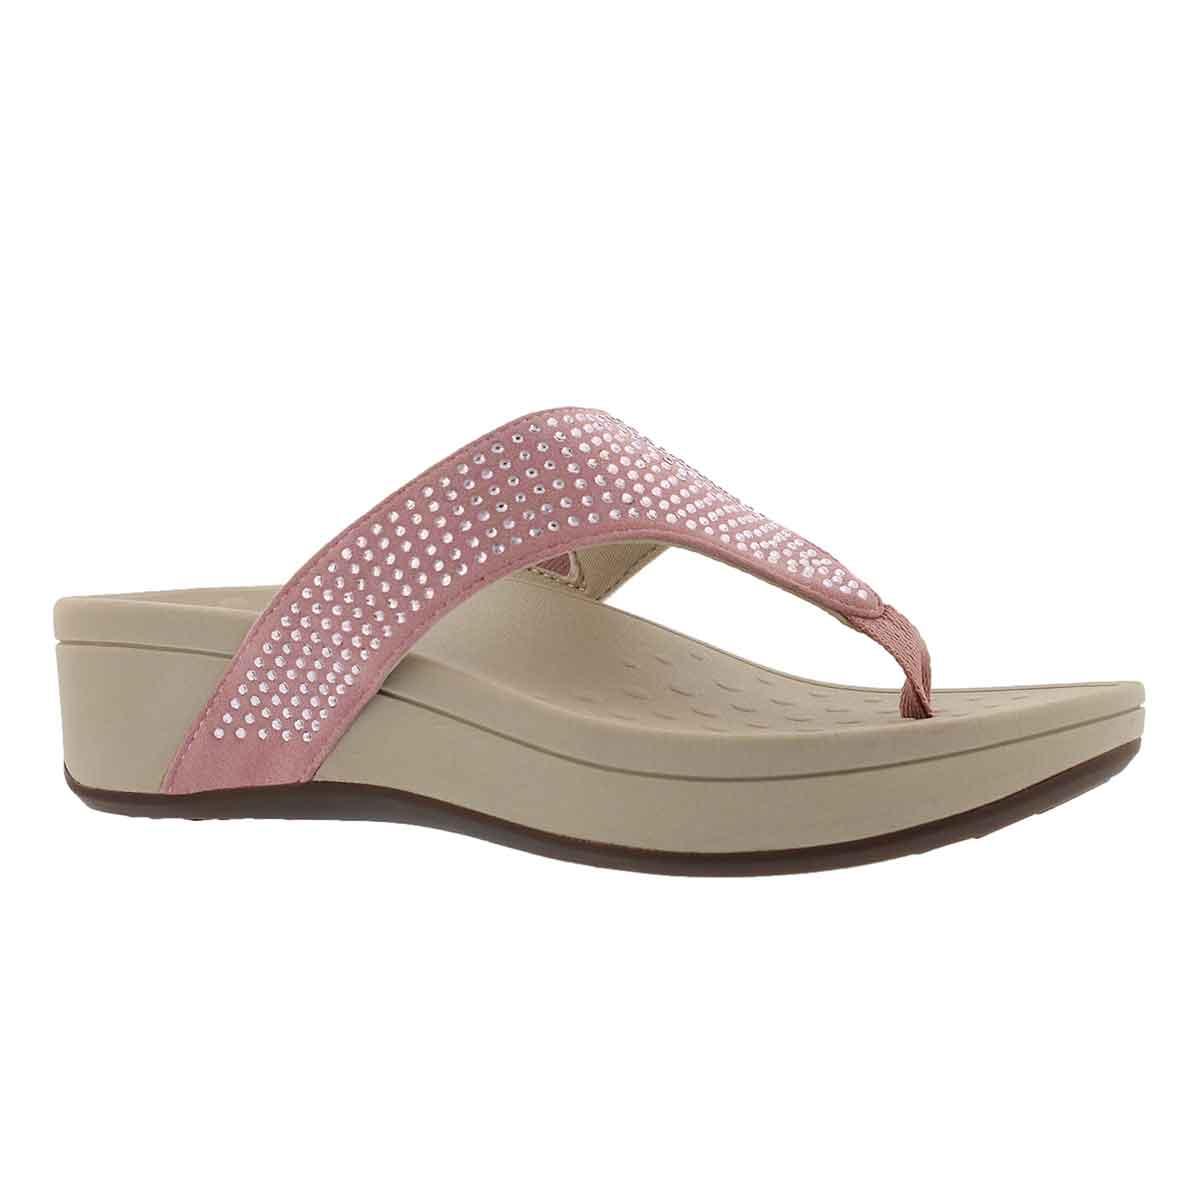 Women's NAPLES blush arch support wedge sandals